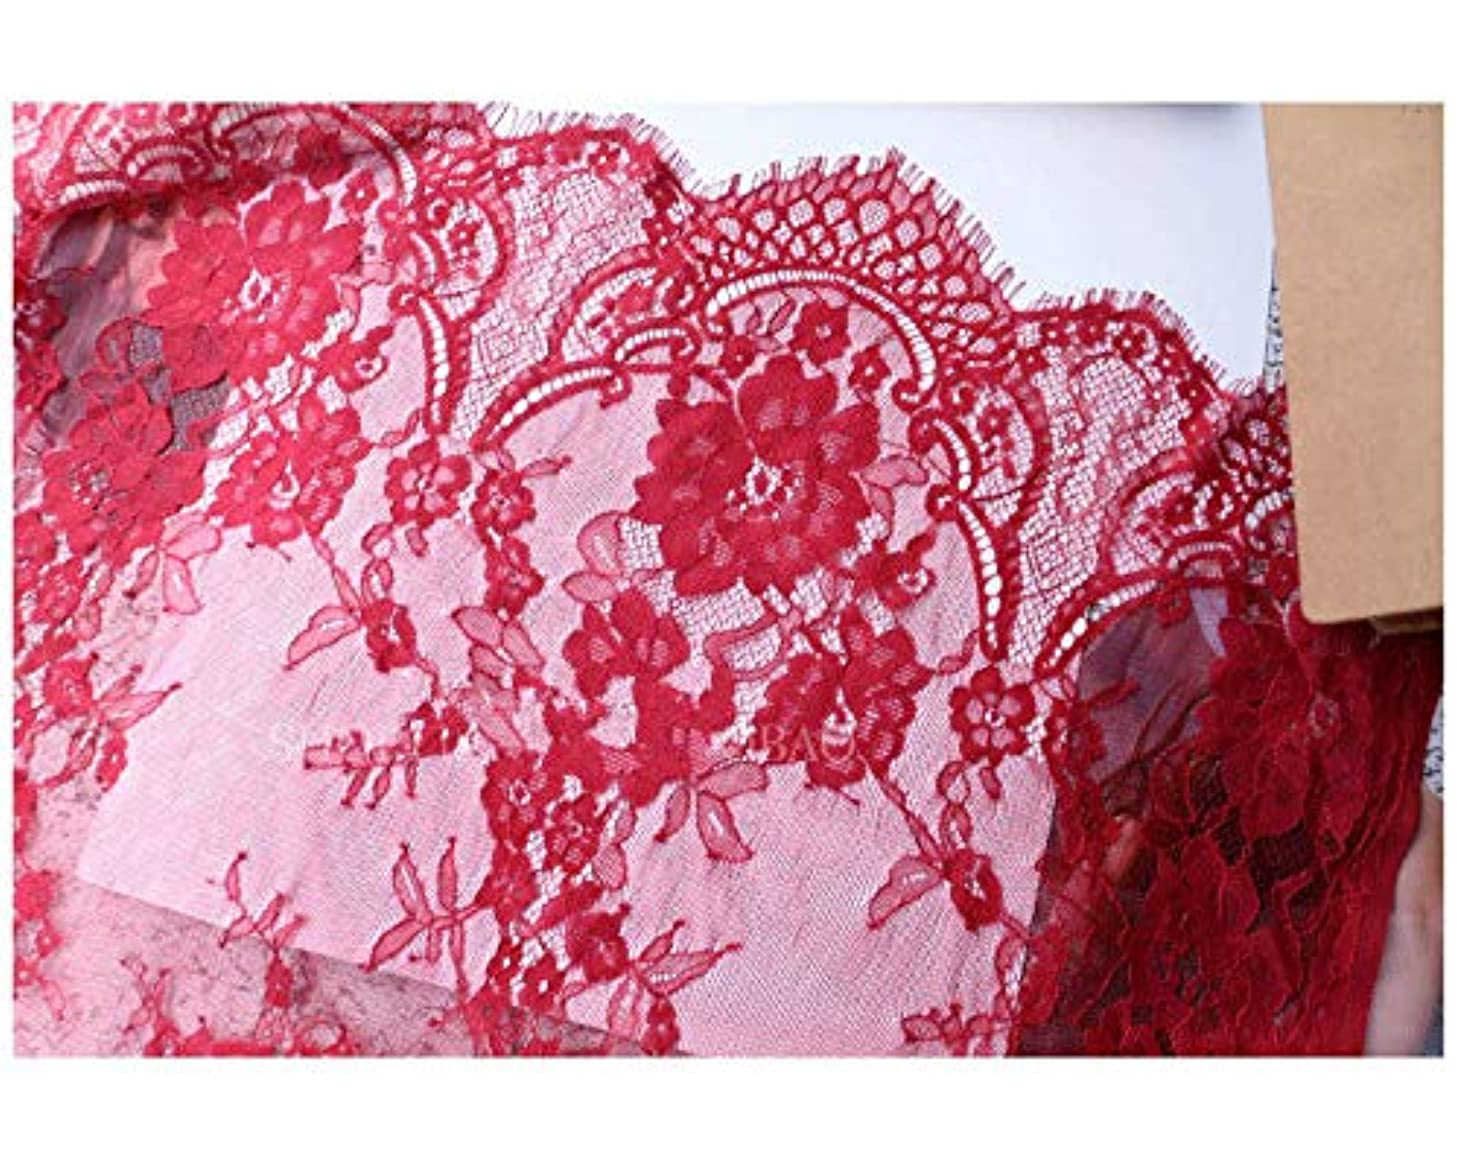 Chantilly Eyelash Edge Lace Fabric Floral Bridal/Wedding Dress Flower African Lace Table Cloth DIY Crafts Trim Applique Ribbon Curtains ALE16 (Red)